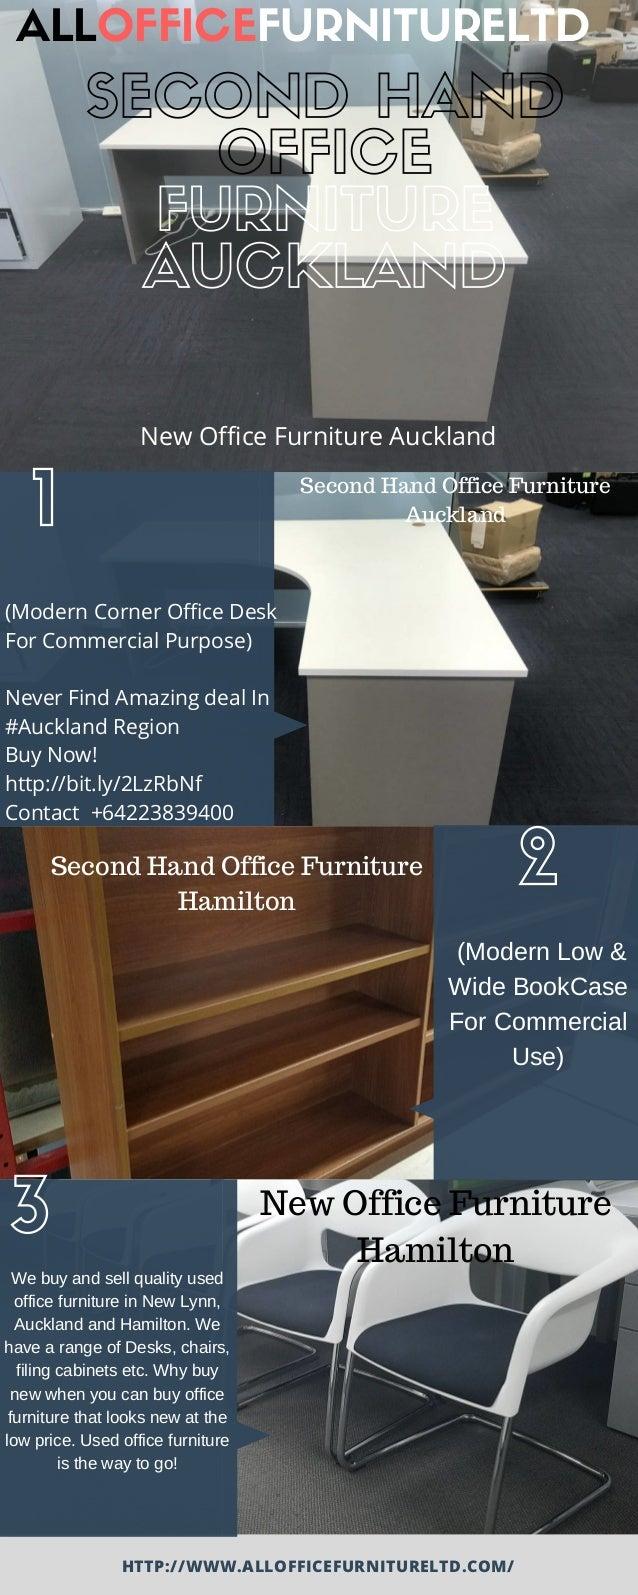 Allofficefurnitureltd second hand office furniture auckland new office furniture auckland modern corner office desk for